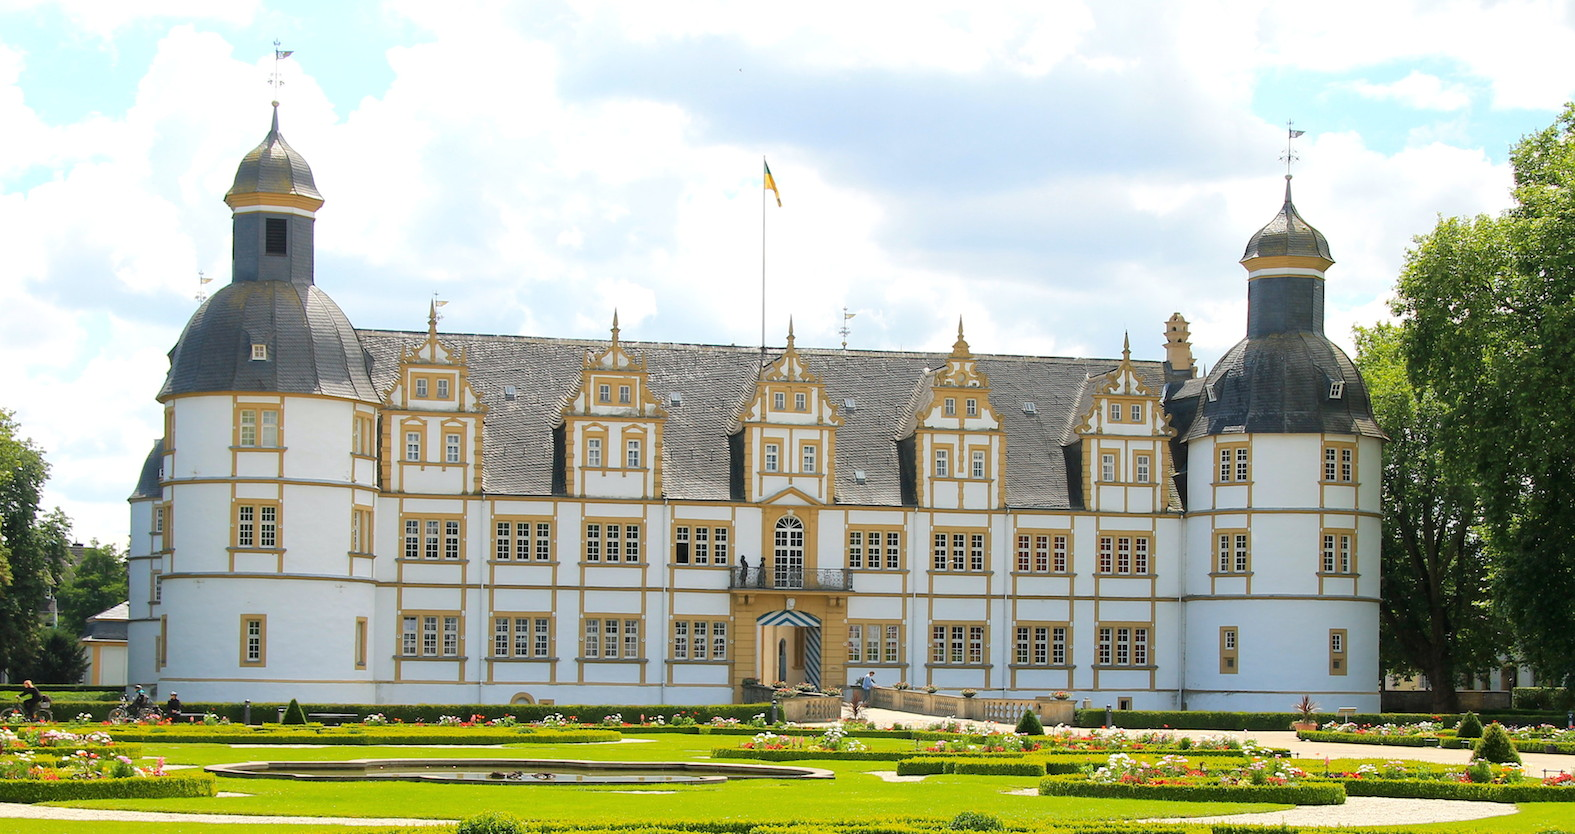 Schlosses Neuhaus